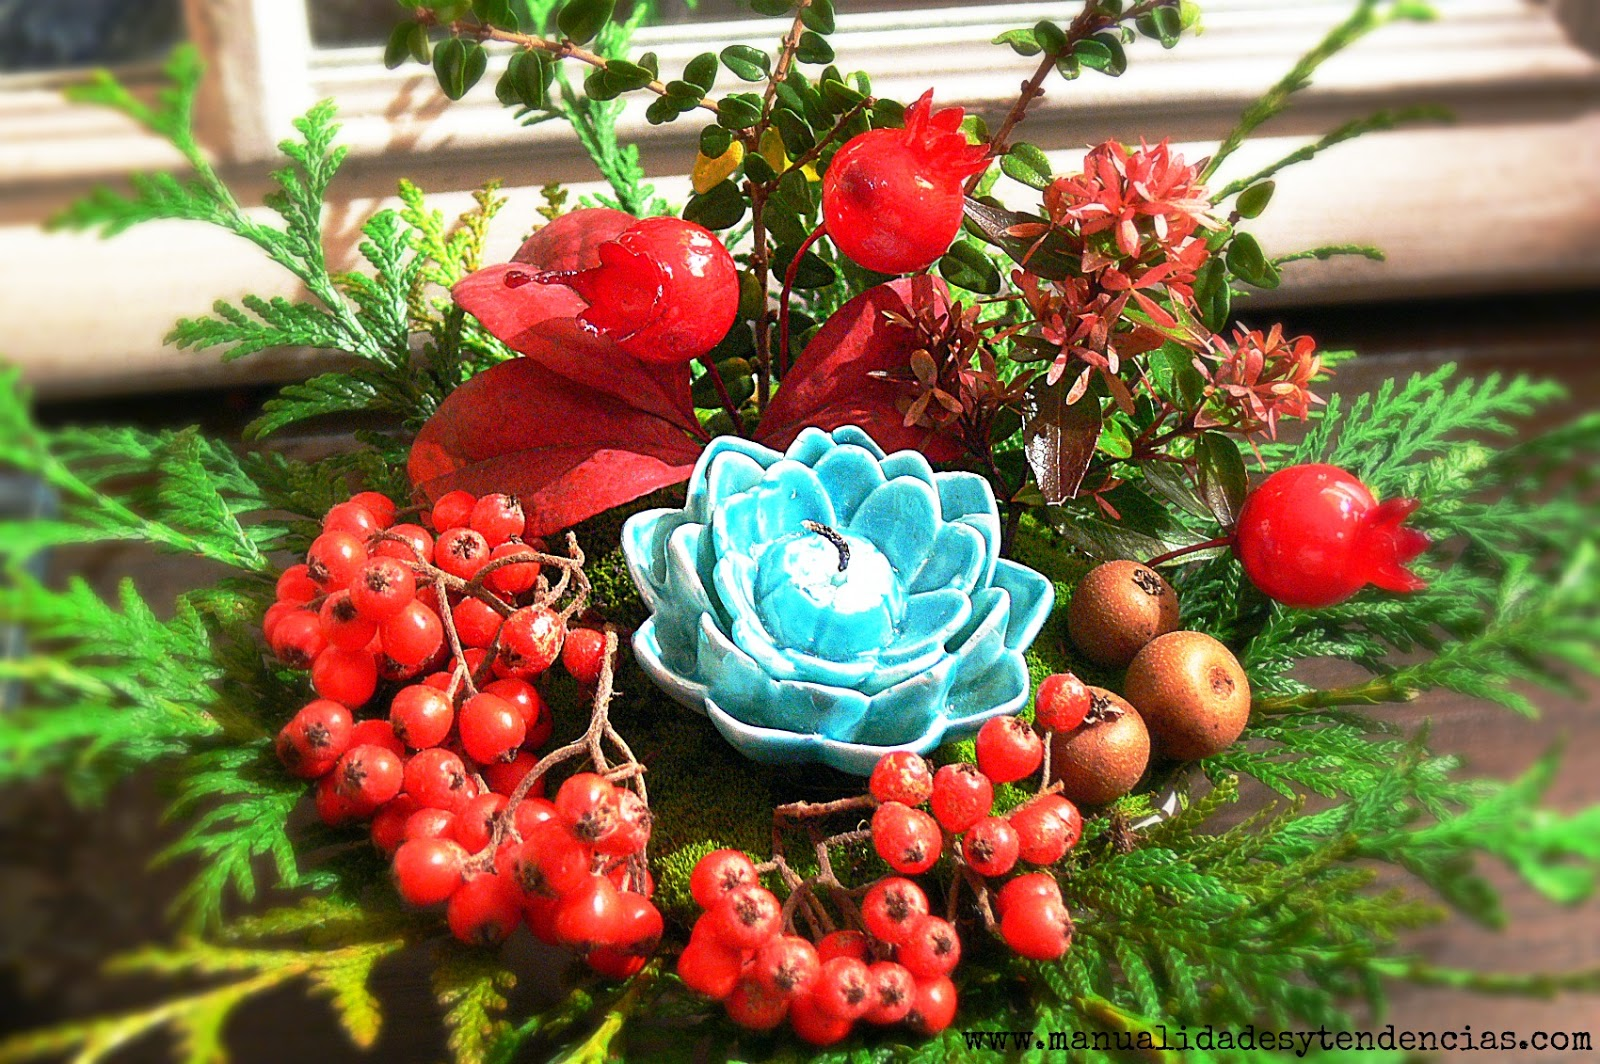 Manualidades y tendencias arreglo floral navide o - Como hacer un centro de mesa navideno ...